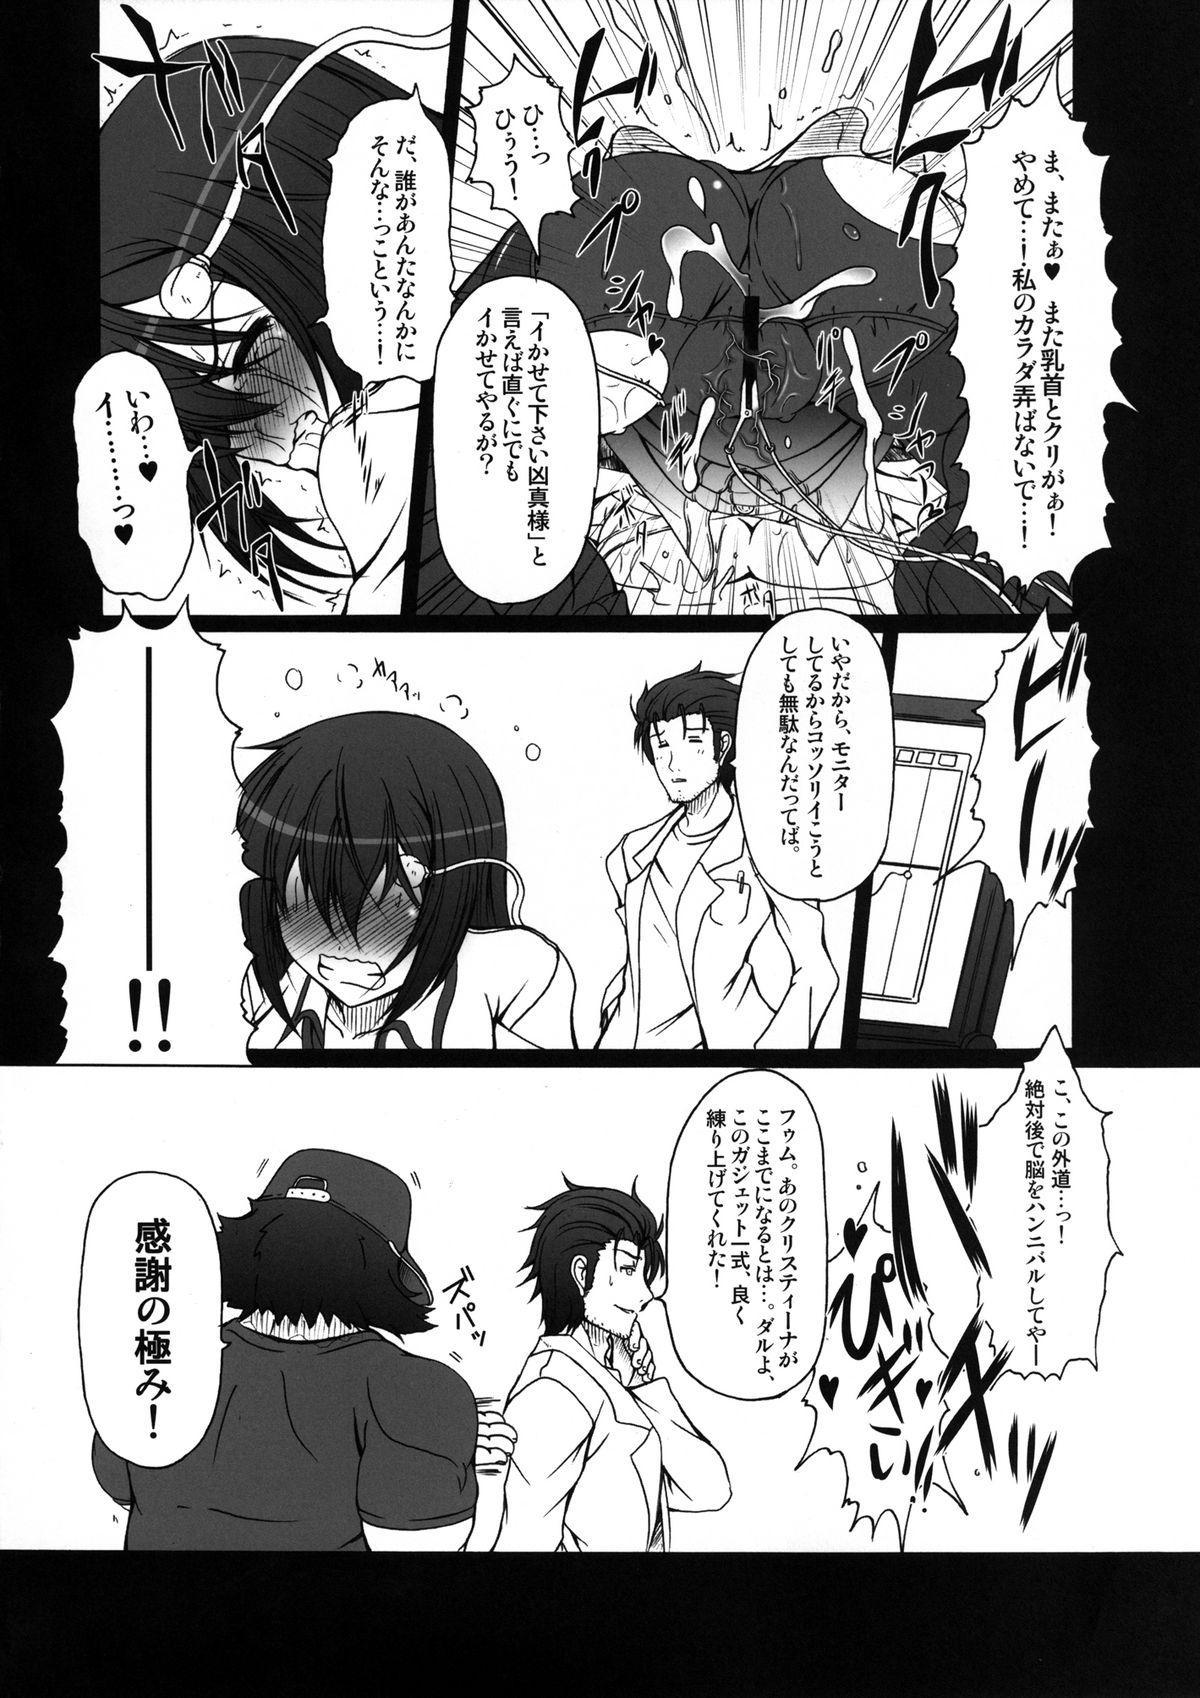 HOBBY'S BLOCK!! 14 Kairaku Tousaku no Ecstasy 15